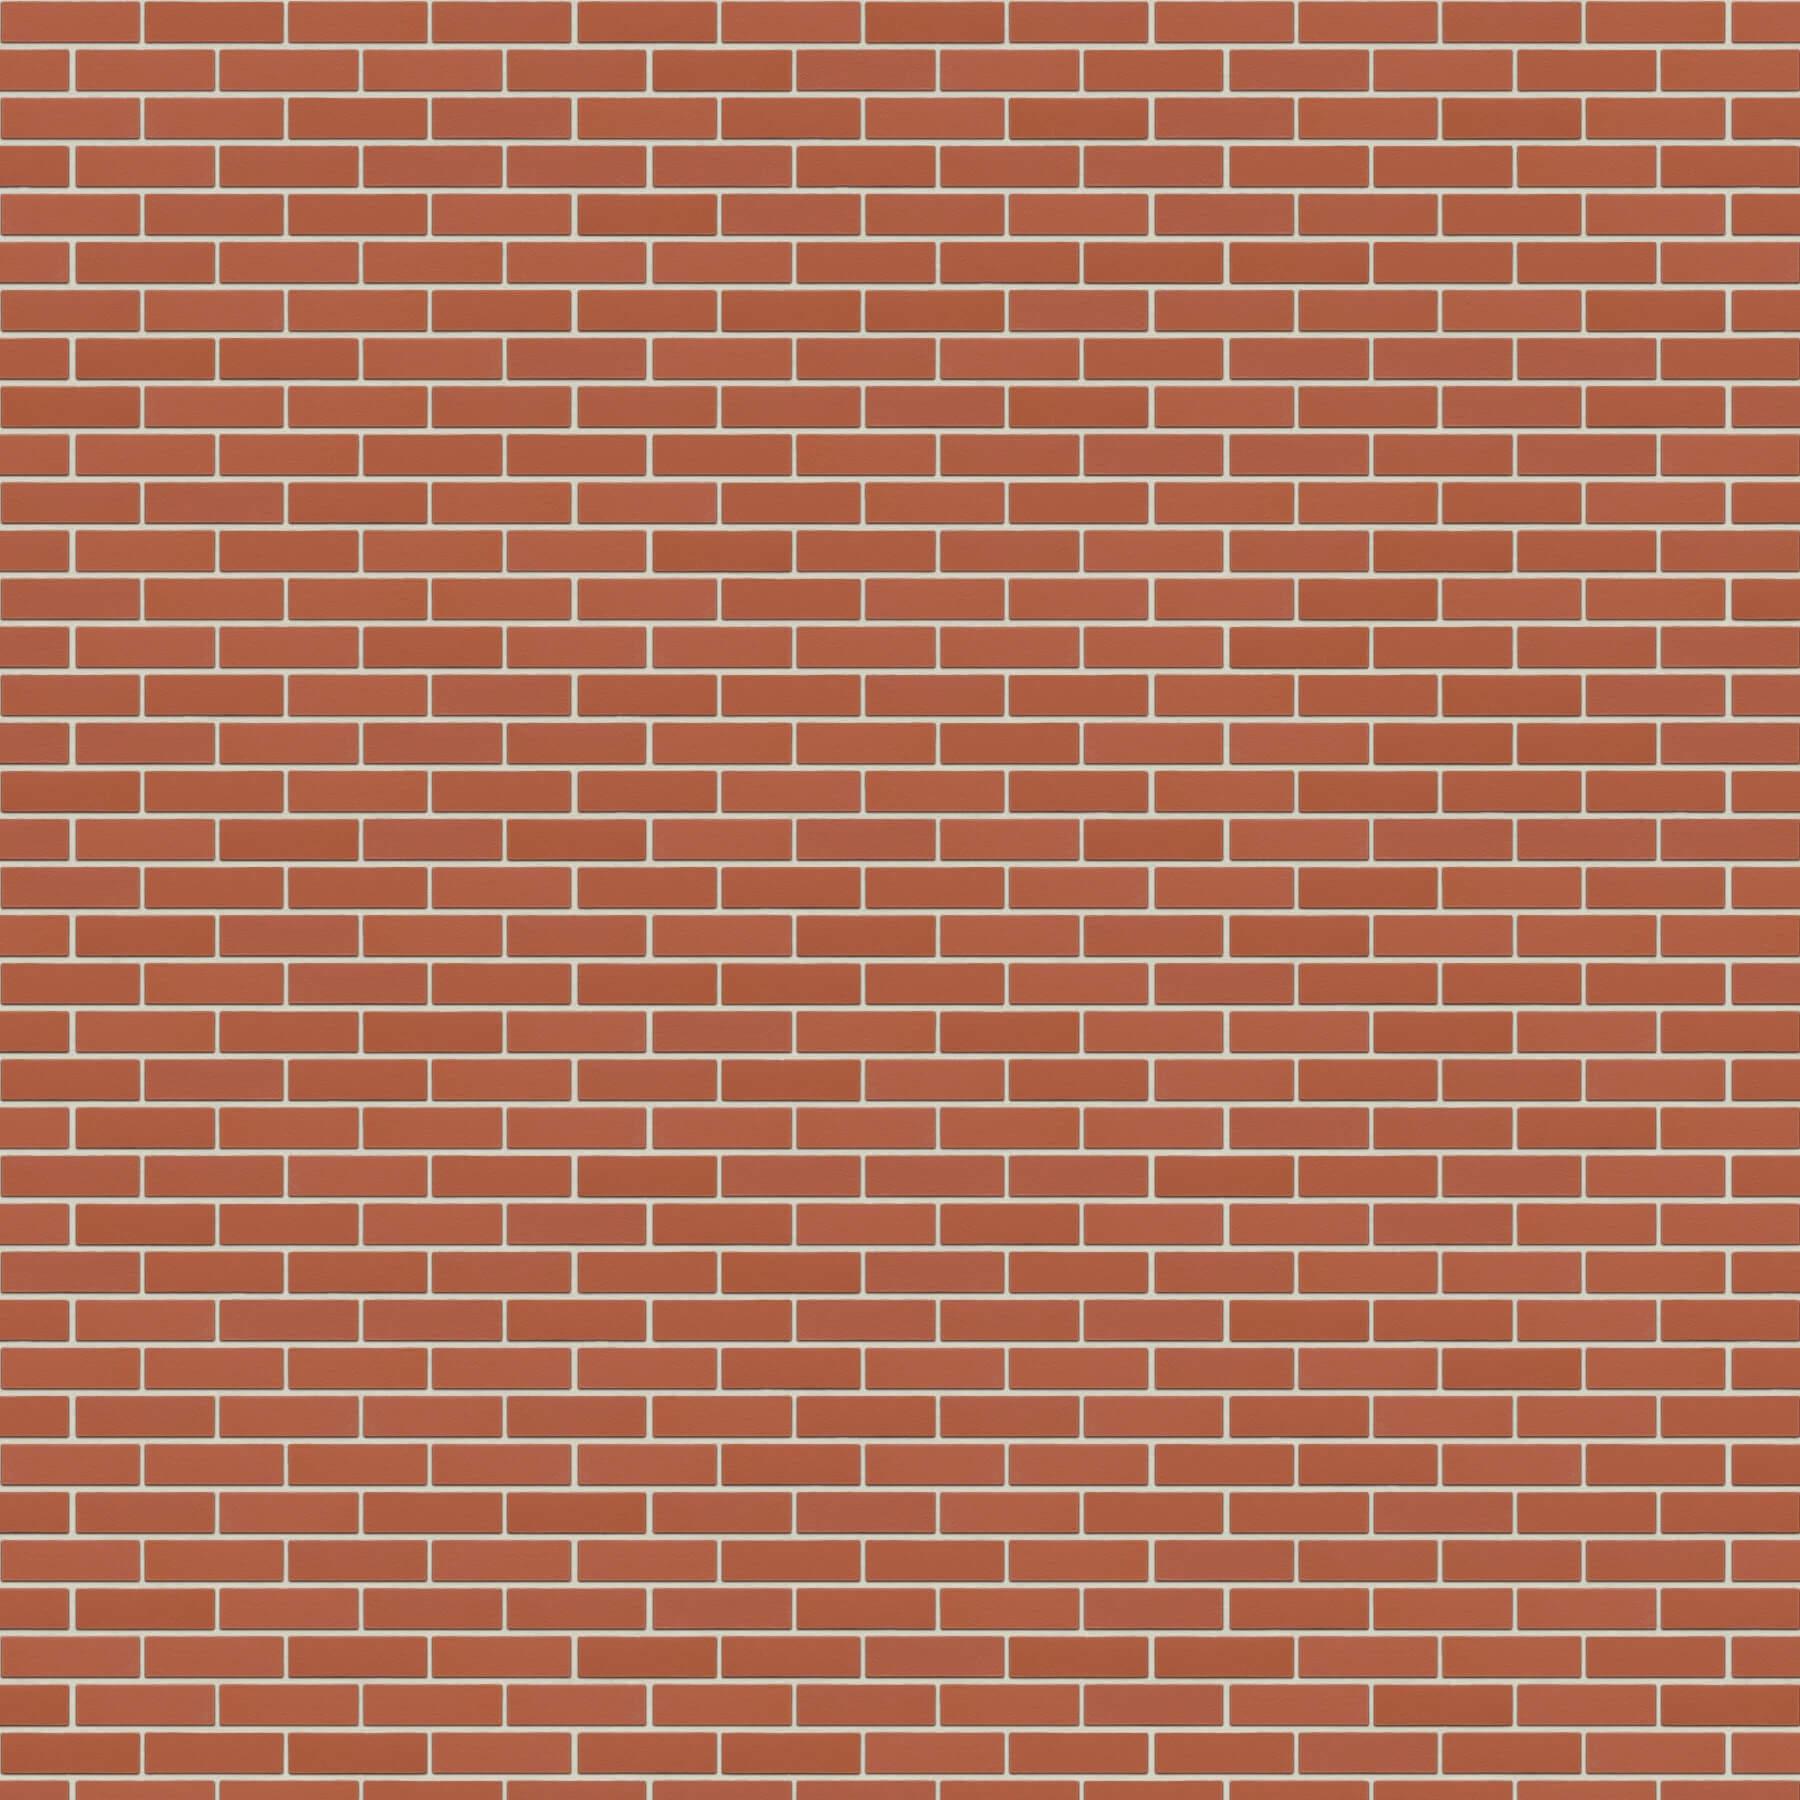 Puna-cigla-FeldHaus-Klinker-brick-house-nf-k-400-Bela Fuga